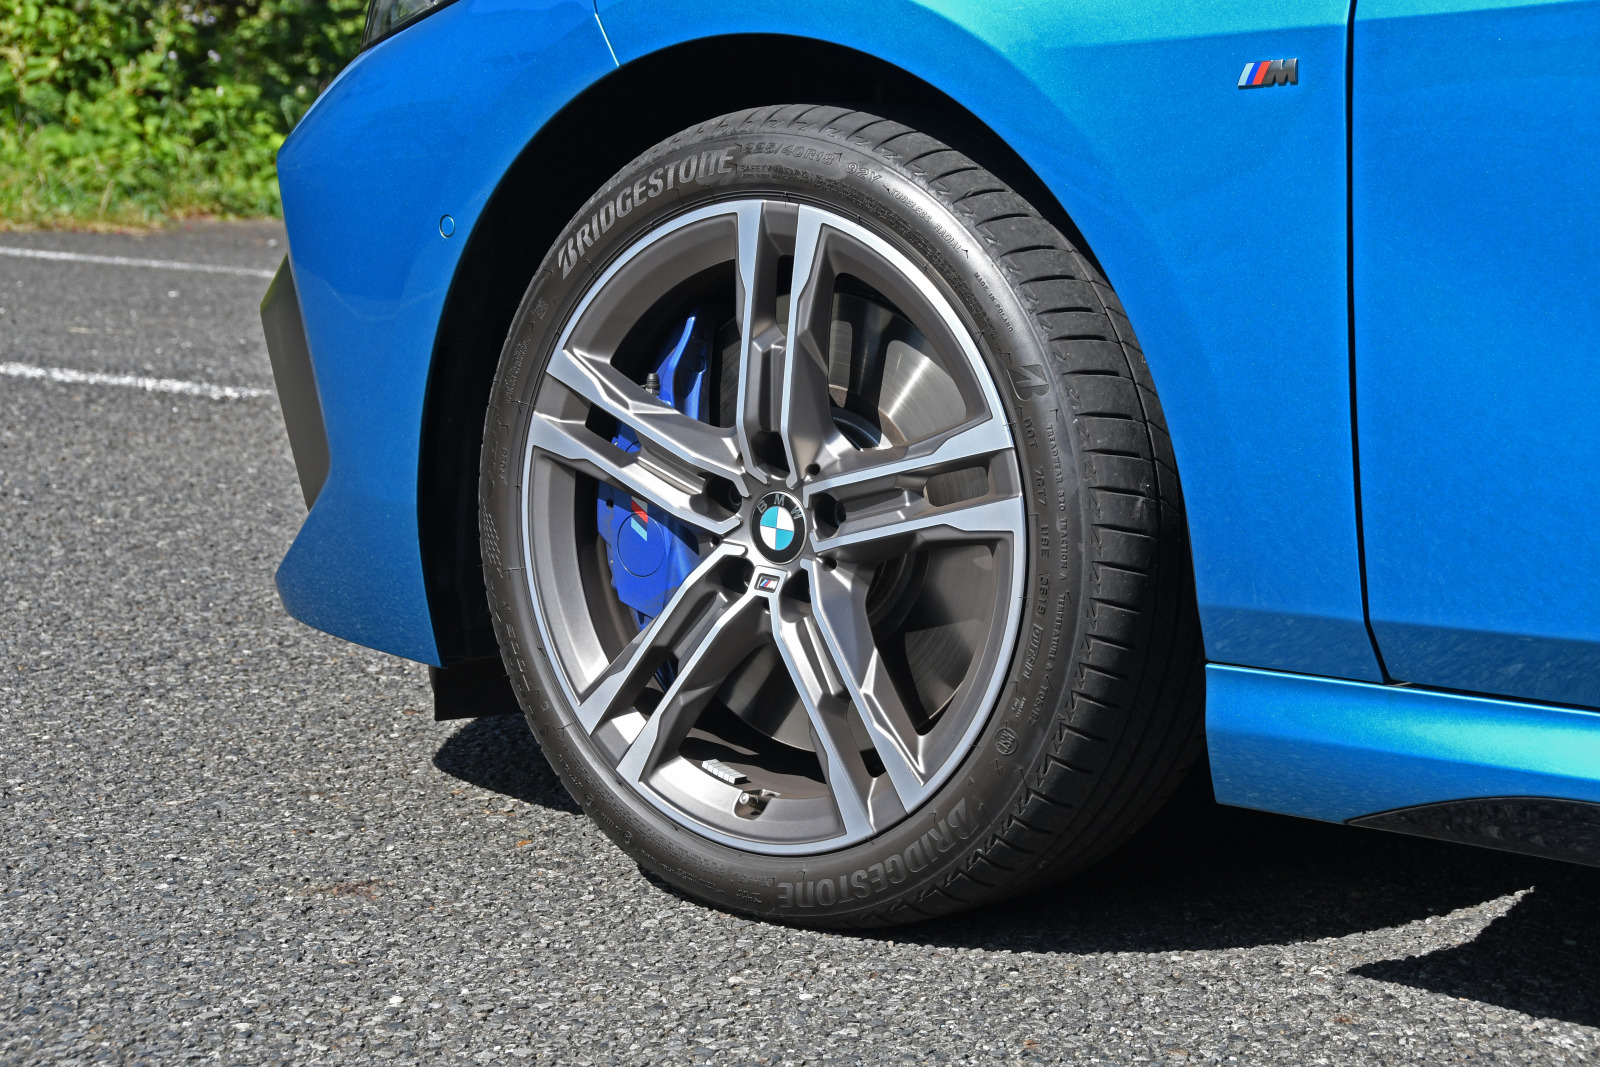 「FFベース4WDの味付けに開眼したBMW 【BMW M235i Xドライブ グランクーペ試乗】」の8枚目の画像